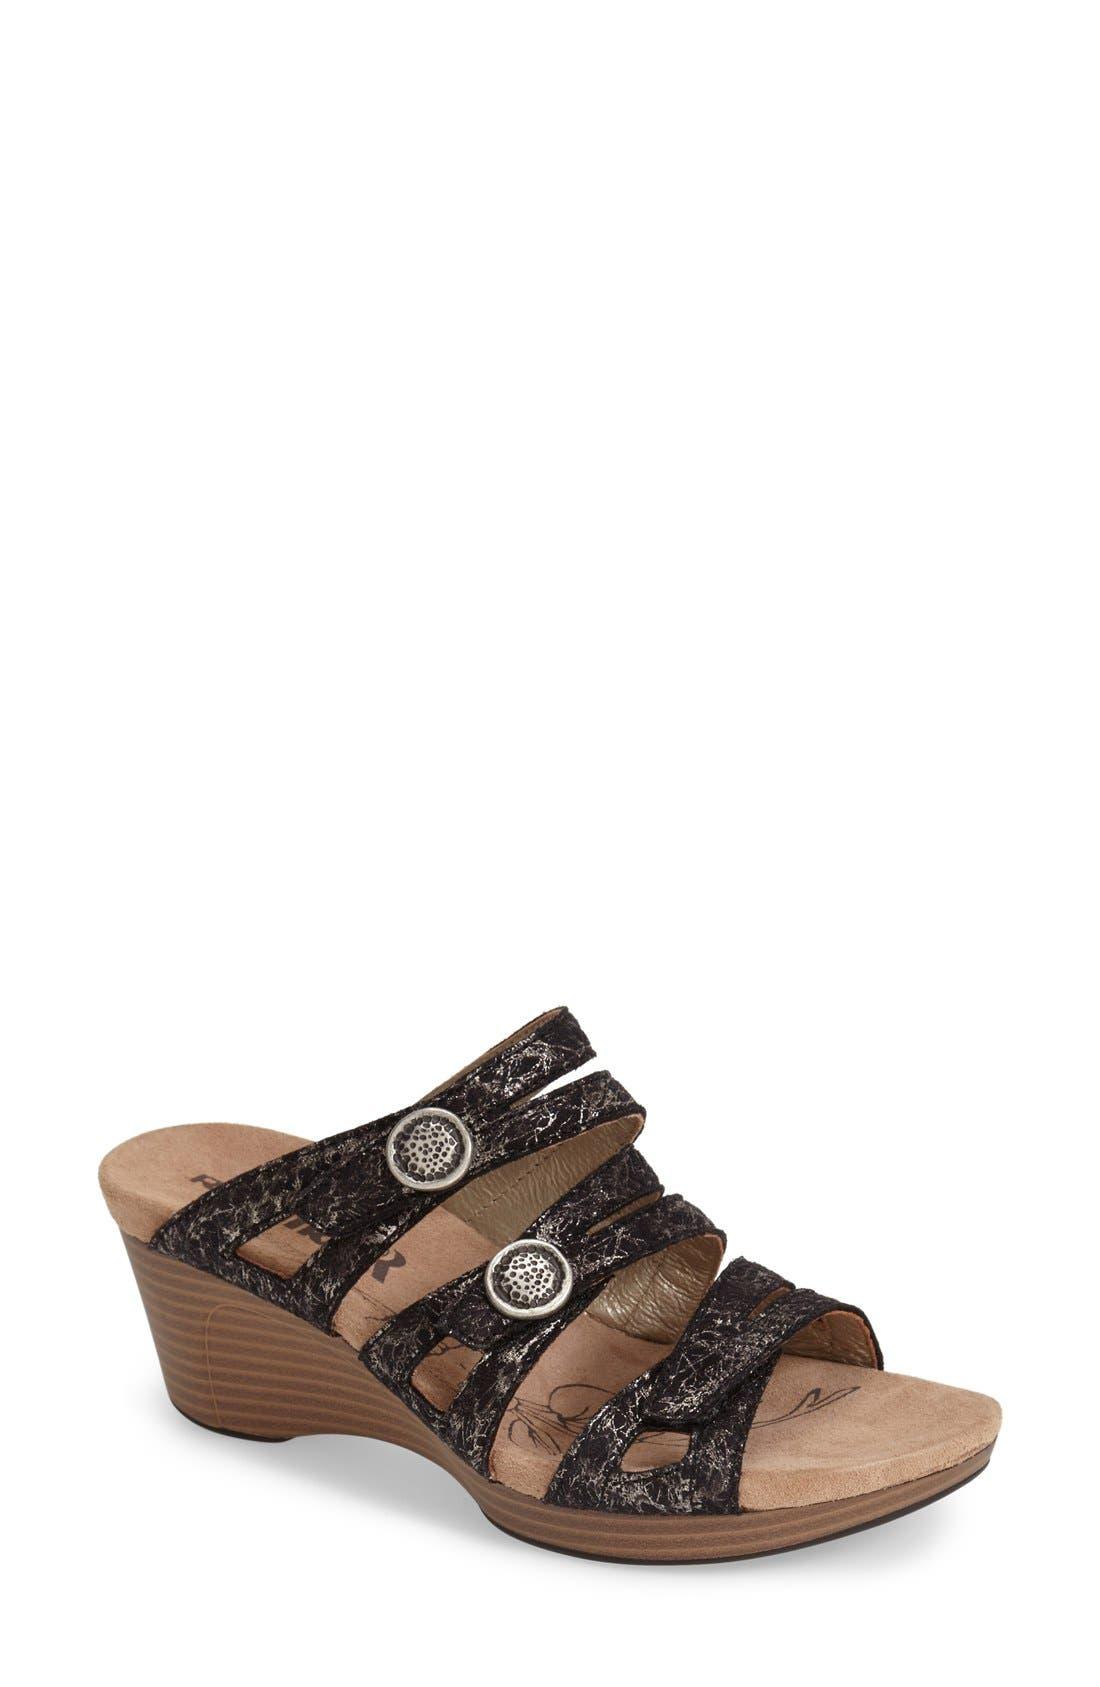 Alternate Image 1 Selected - Romika® 'Jamaika 02' Sandal